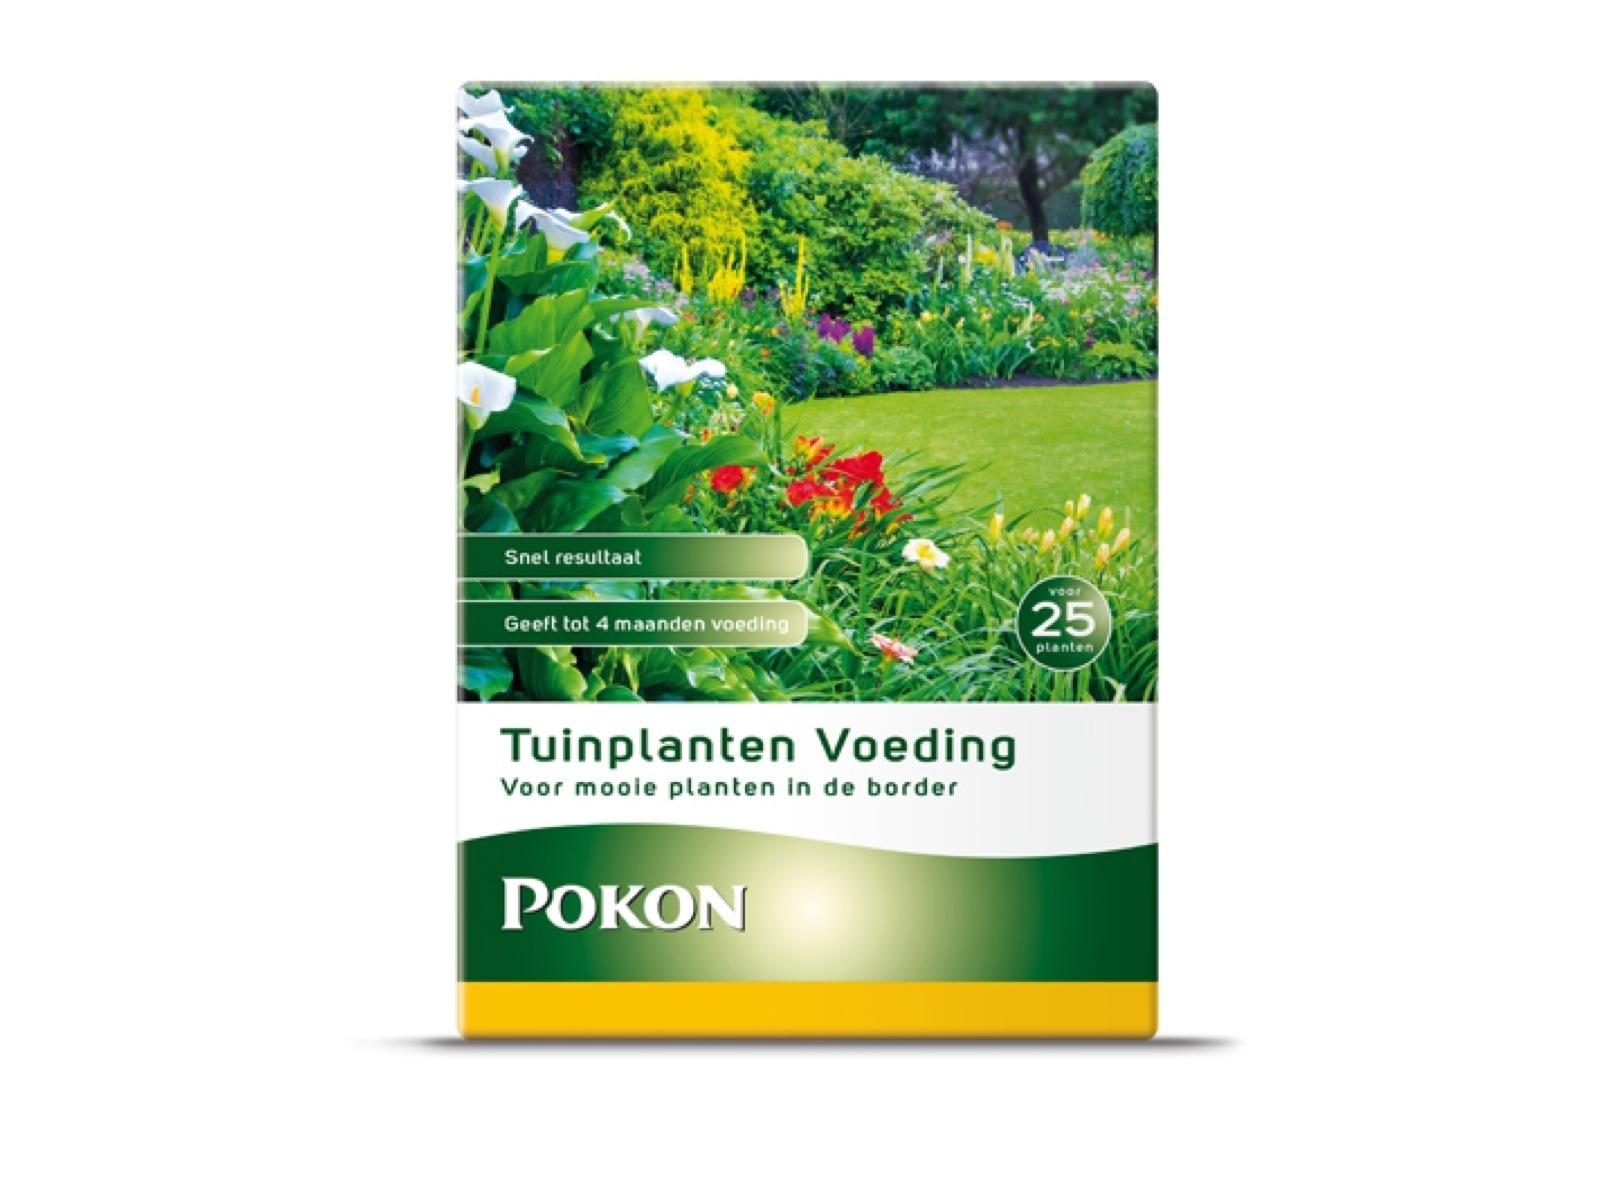 Pok. tuinplantenvoeding 800 g